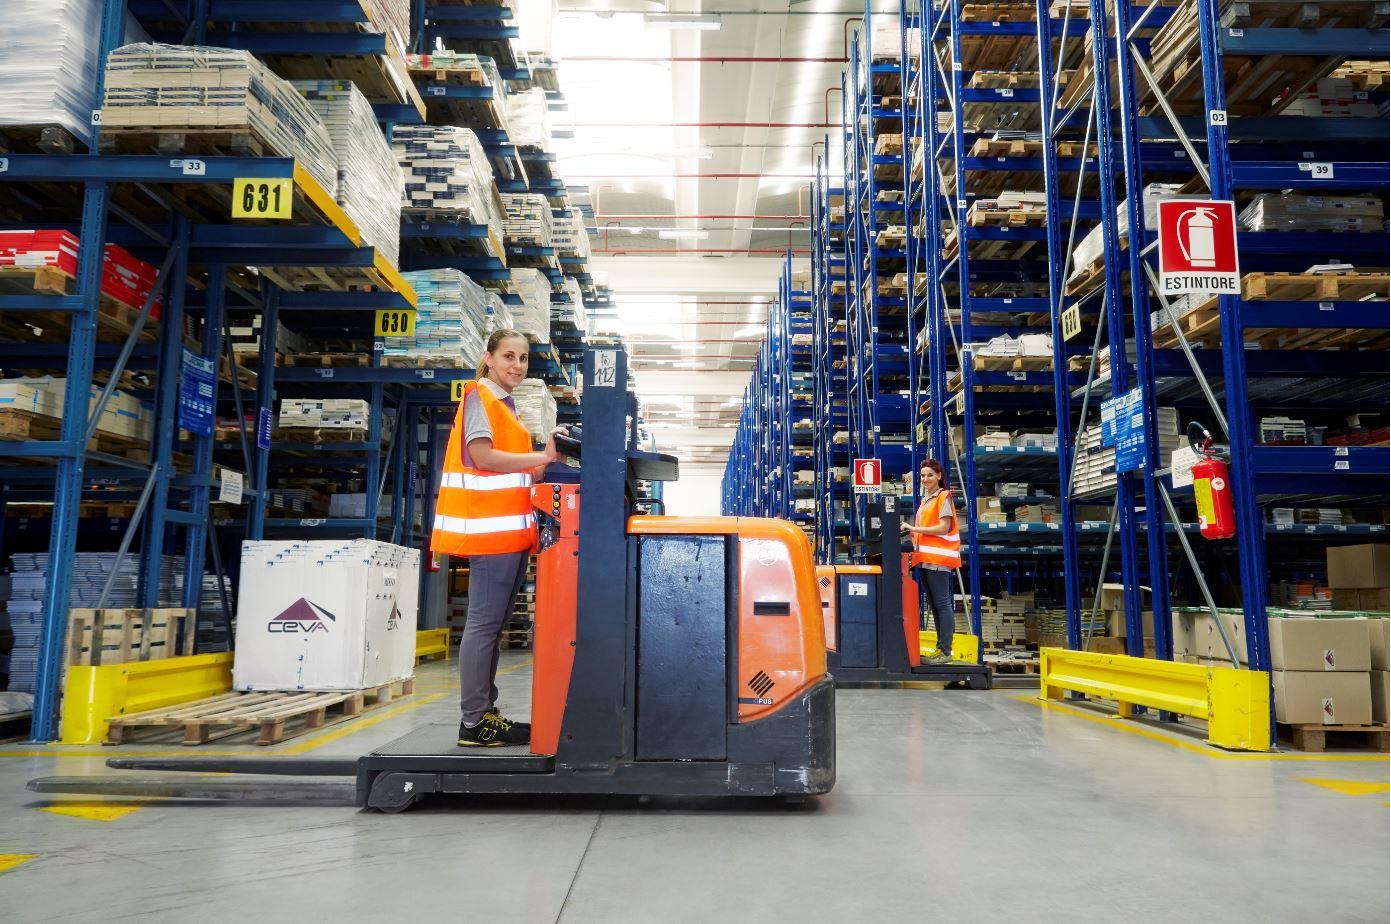 CEVA logistics mondadori partnership editore